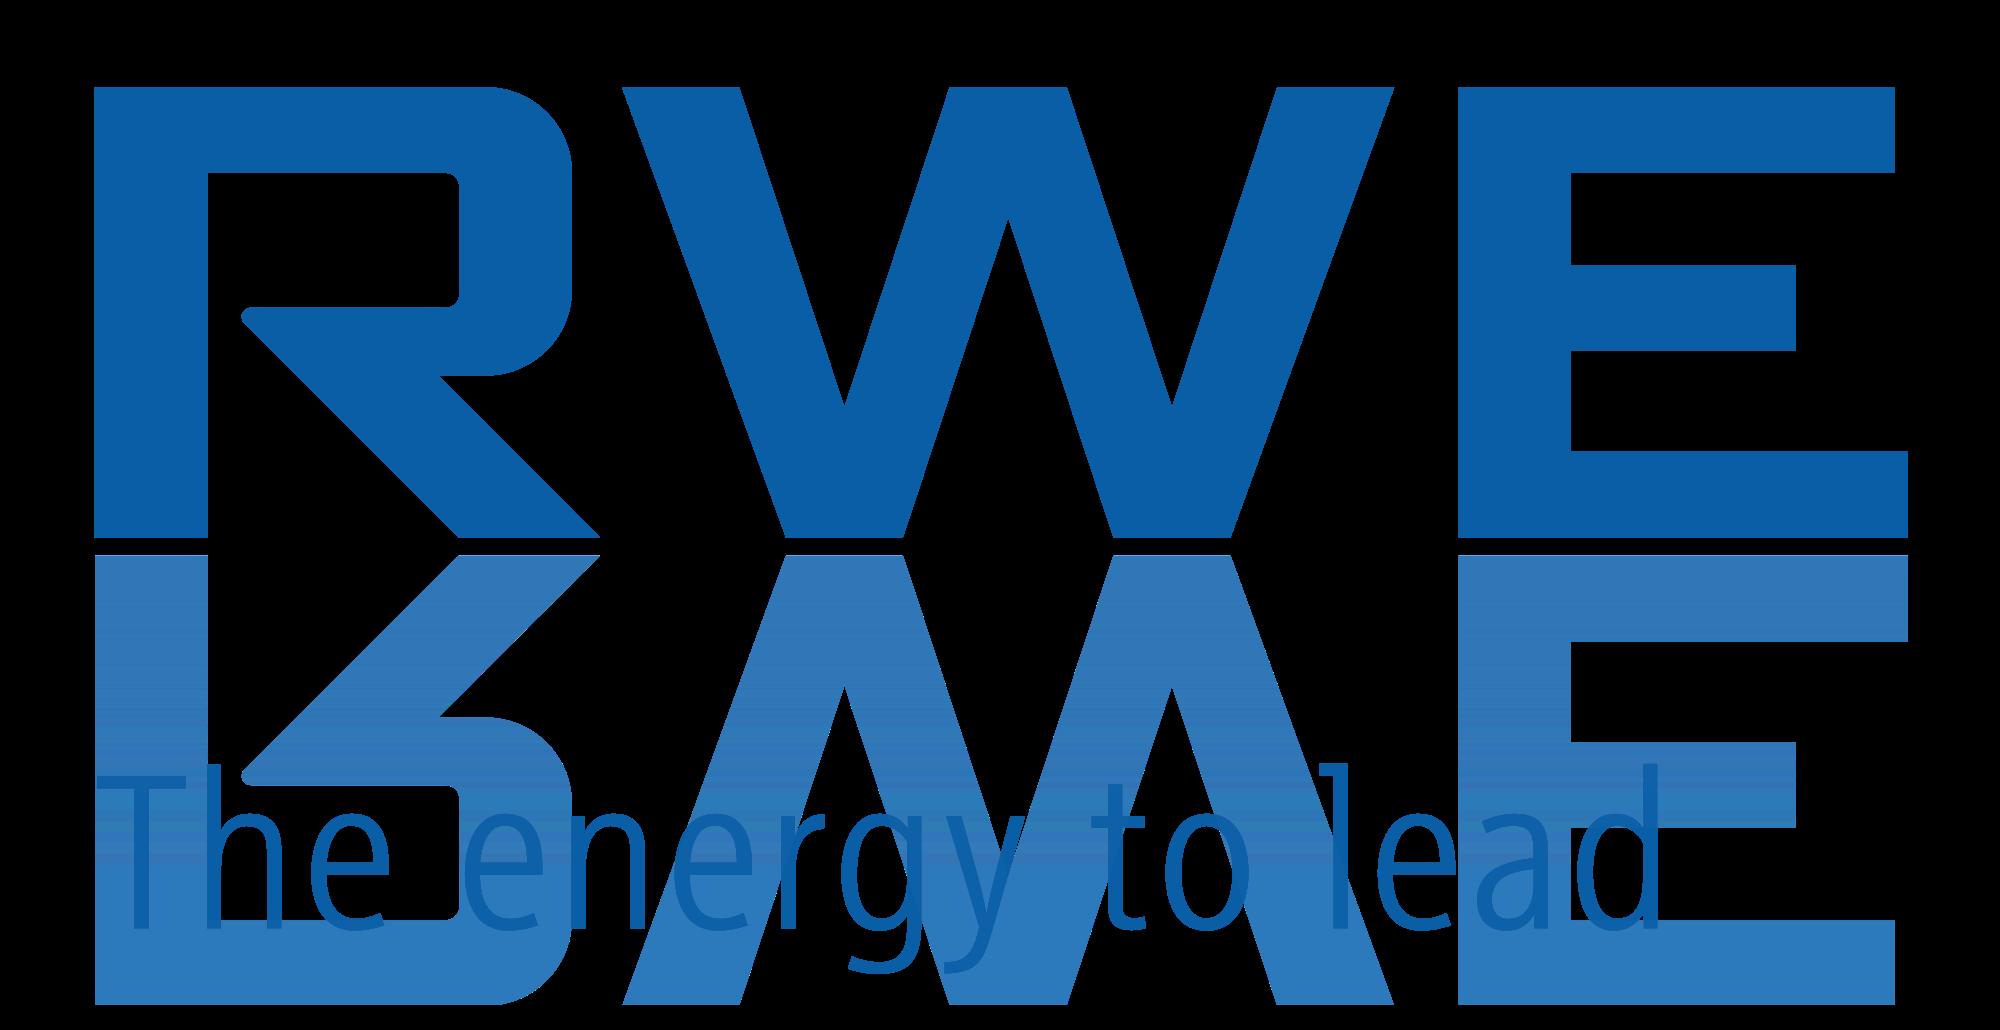 Cena plynu u RWE